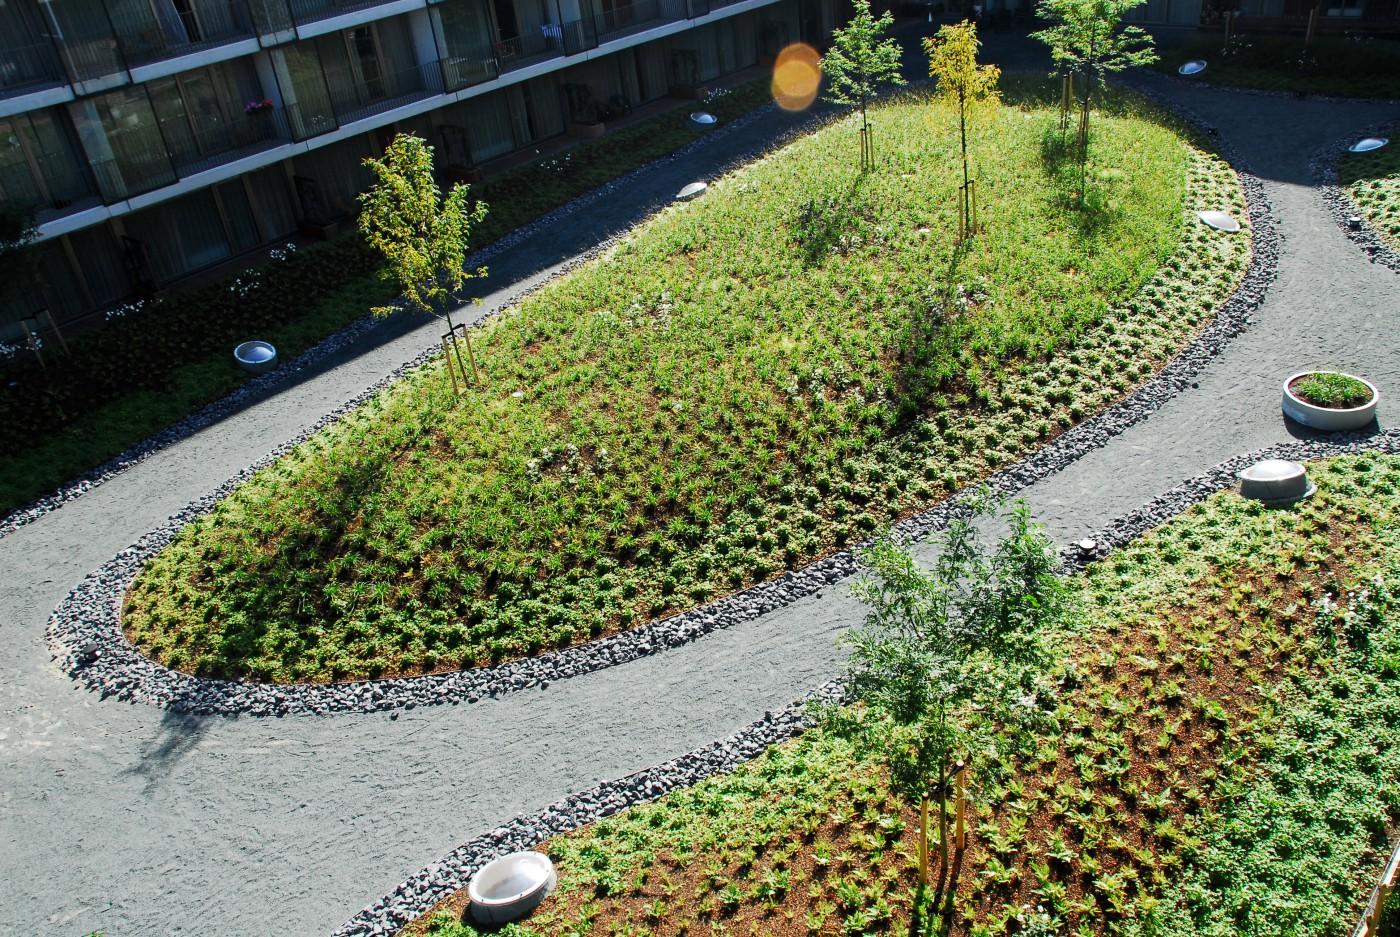 buro-sant-en-co-landschapsarchitectuur-Masira-Amsterdam-Hof-A-grassentuin-daktuin-atollen-rainproof-roofgarden